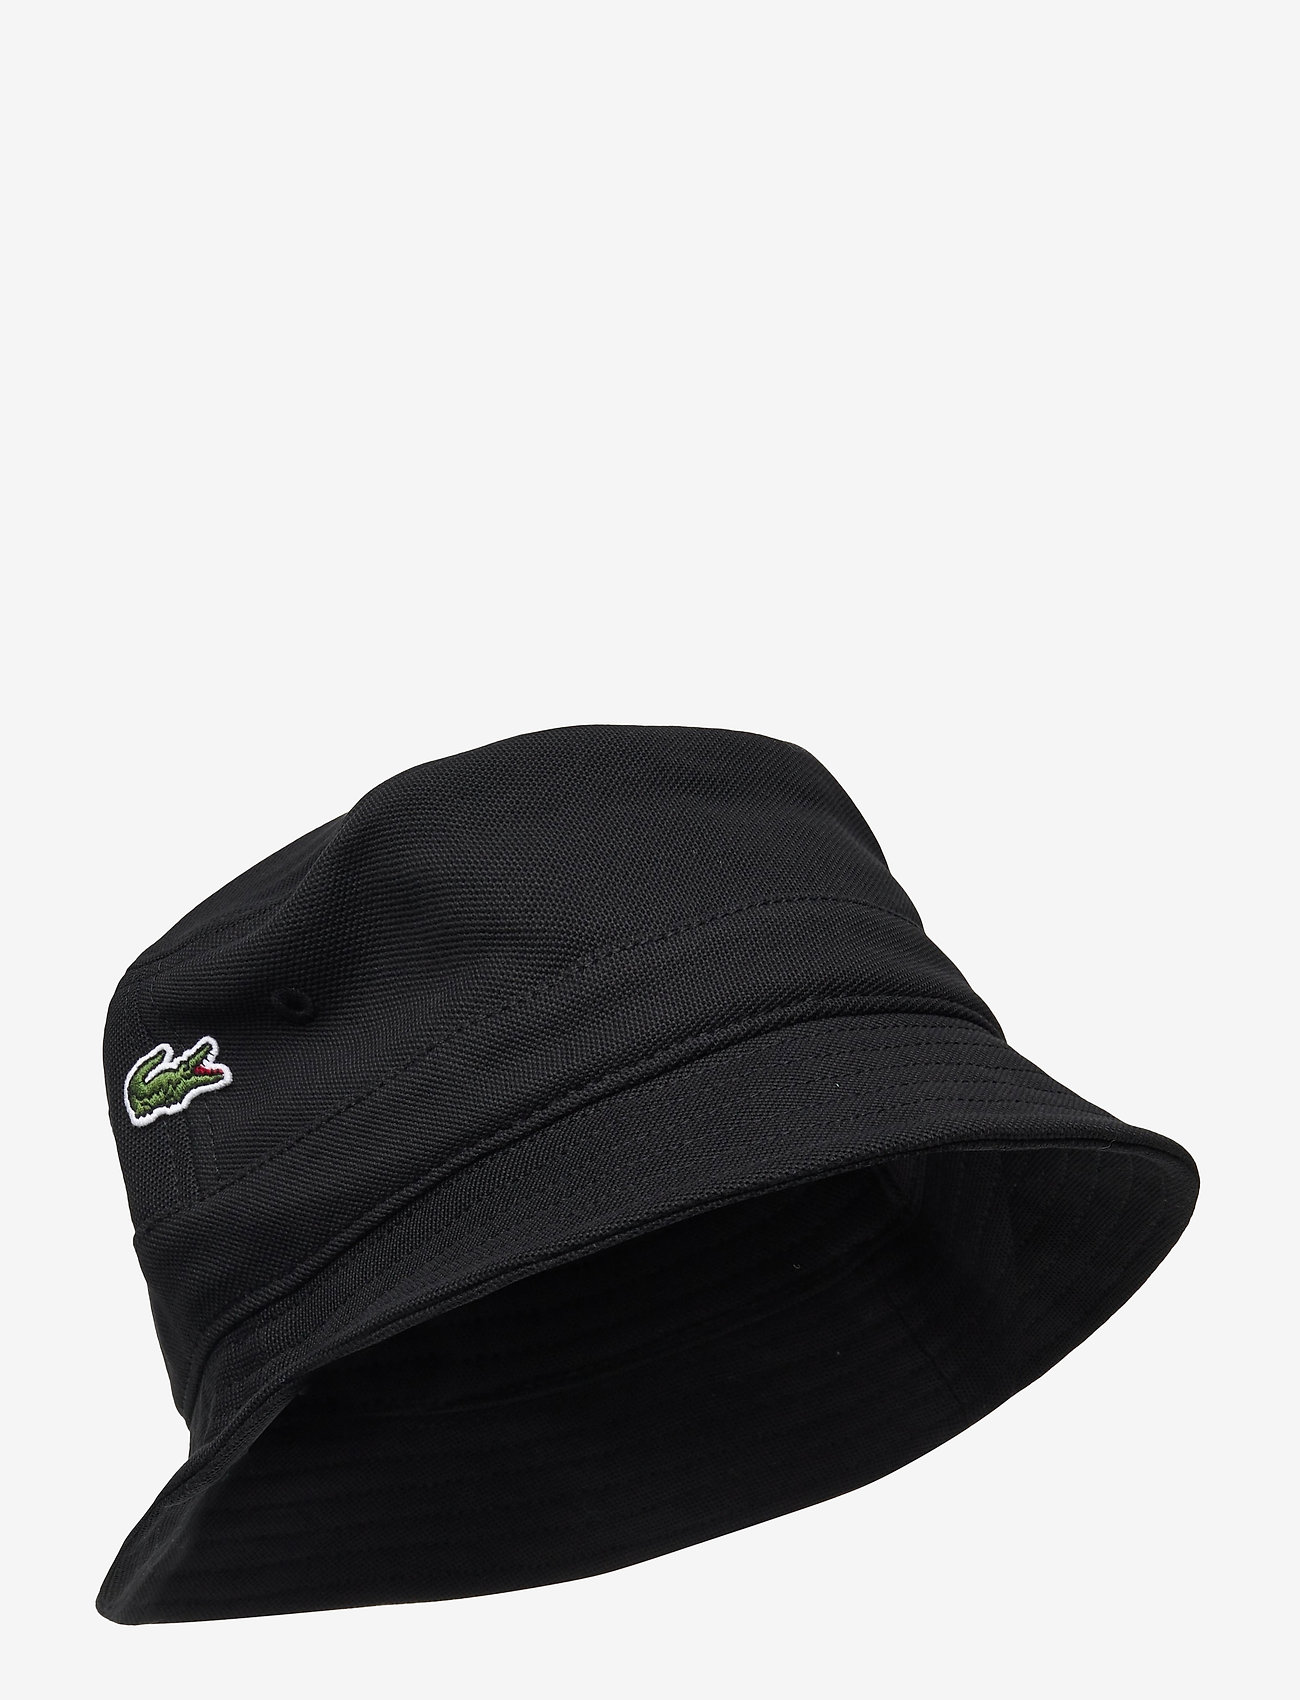 Lacoste - Cap - bucket hats - black - 0